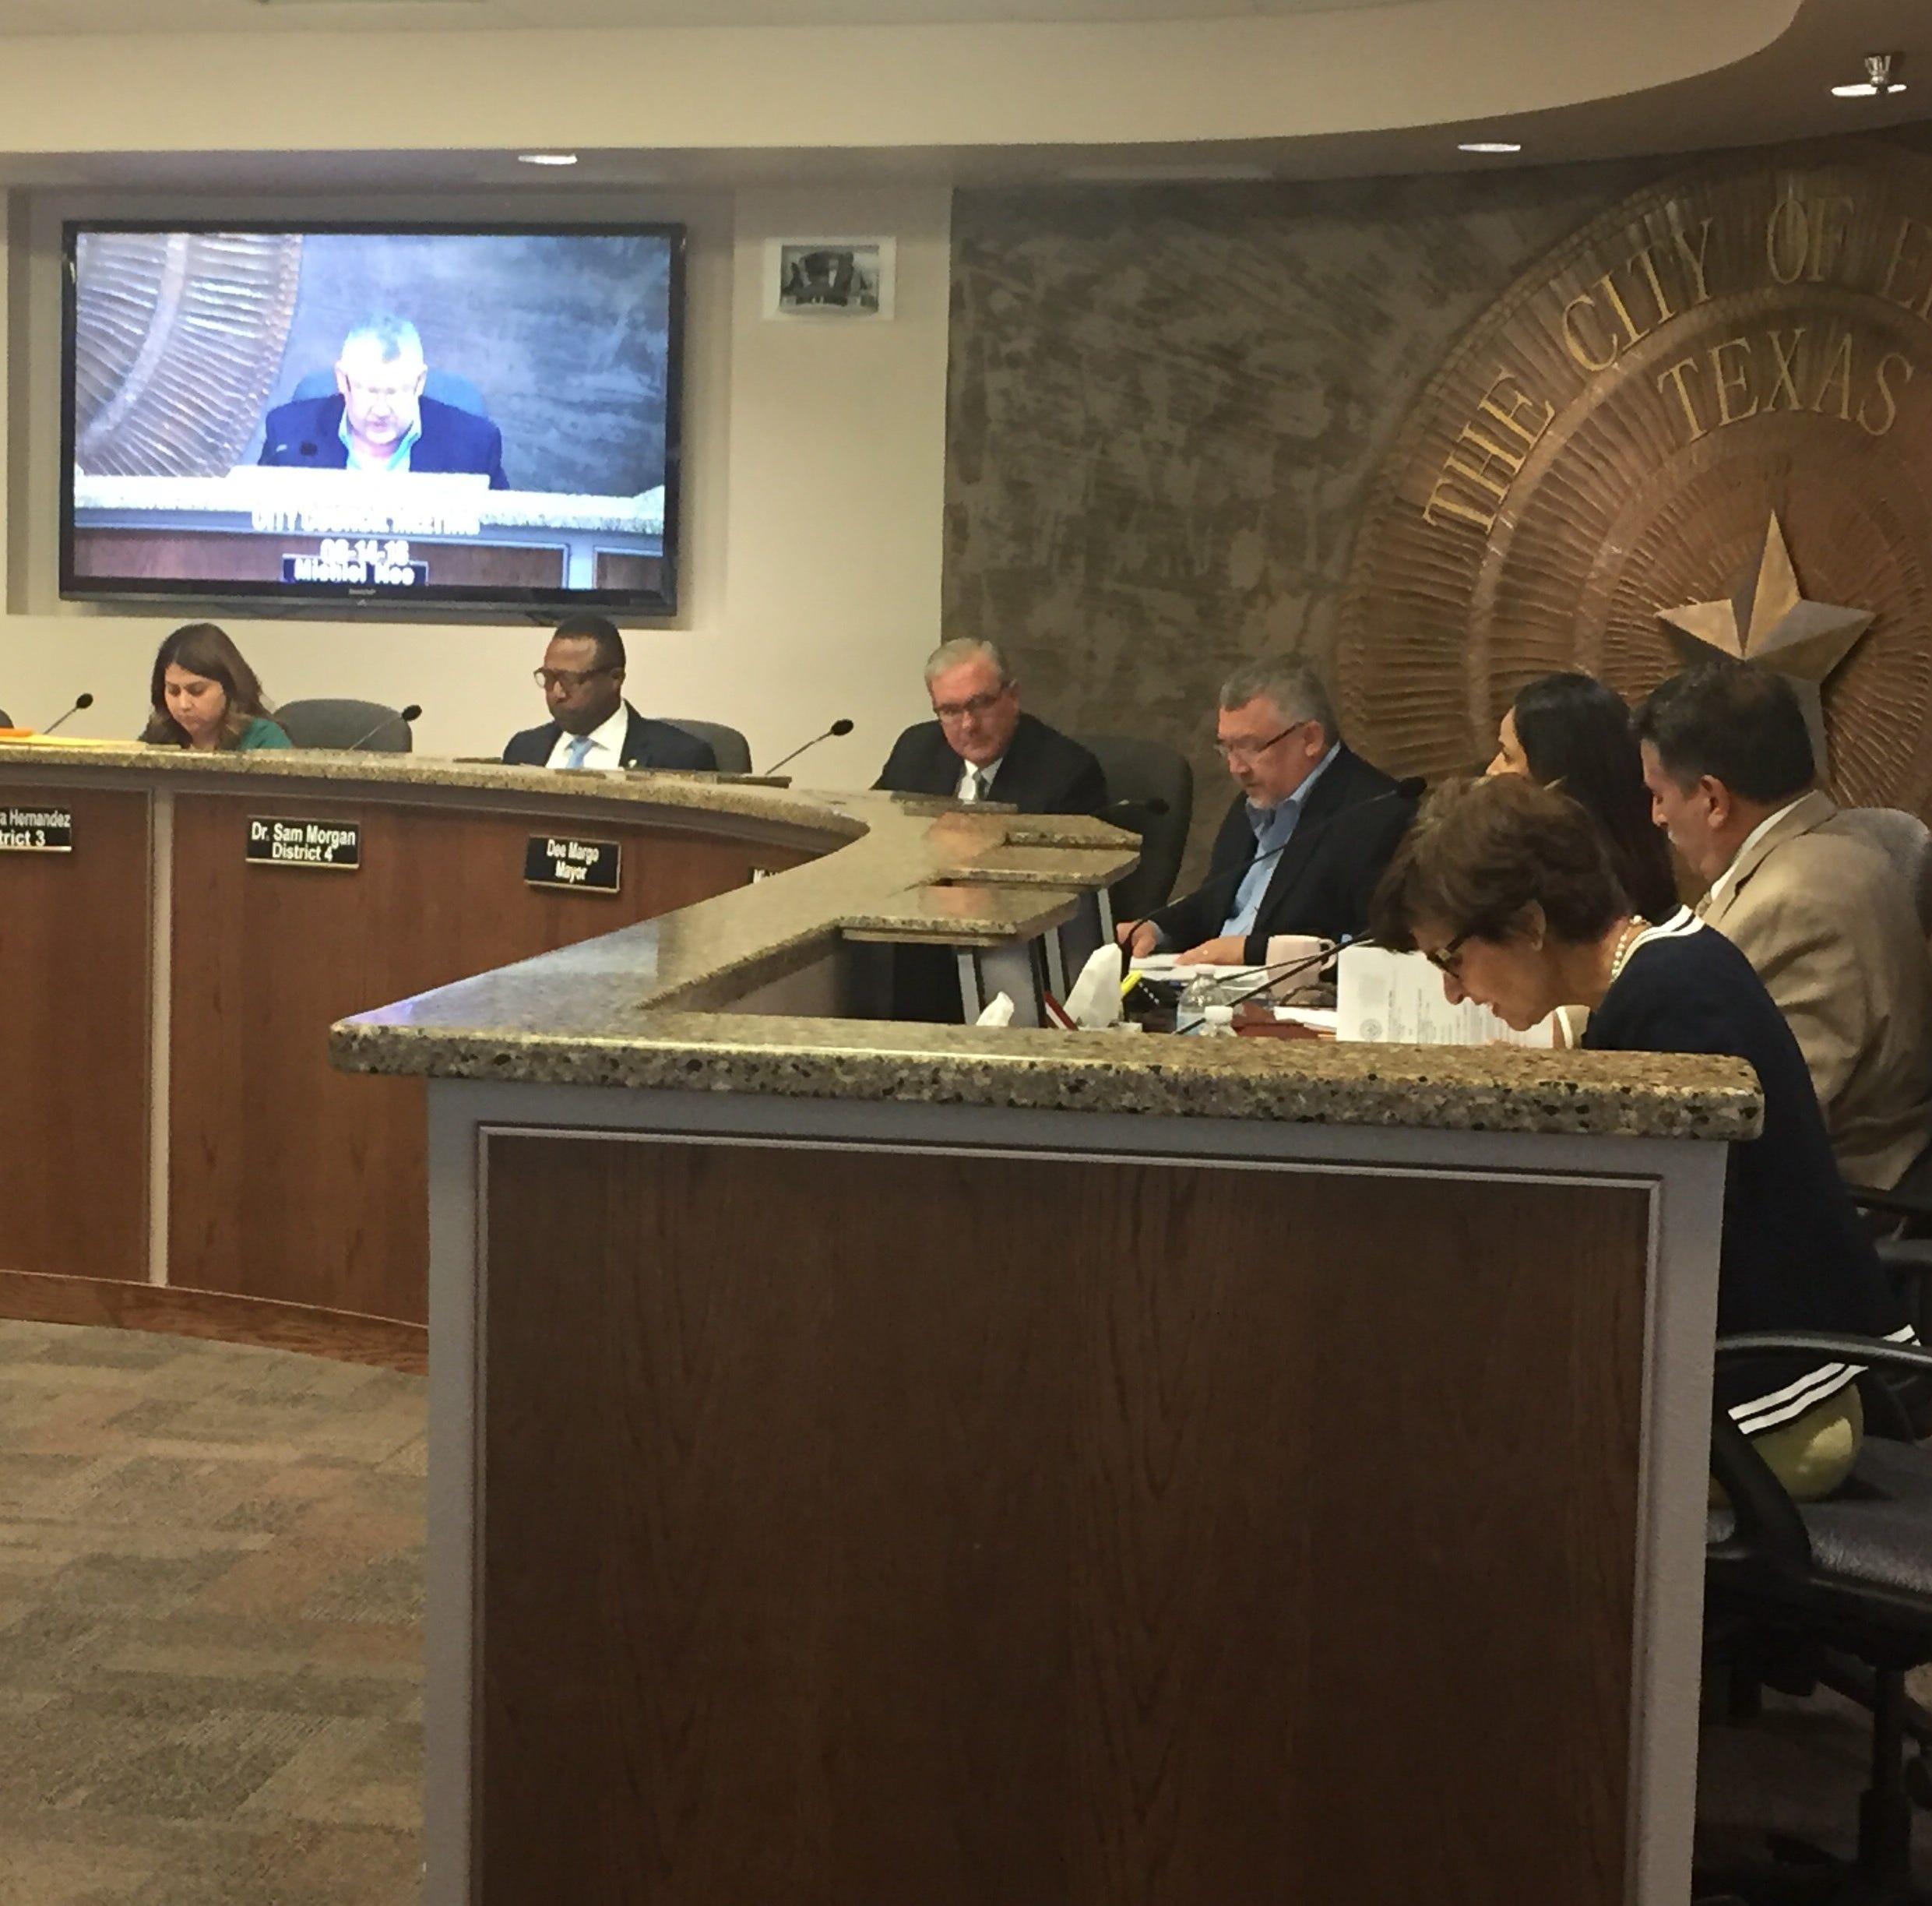 Referendum on City Council pay long overdue: Richard Dayoub